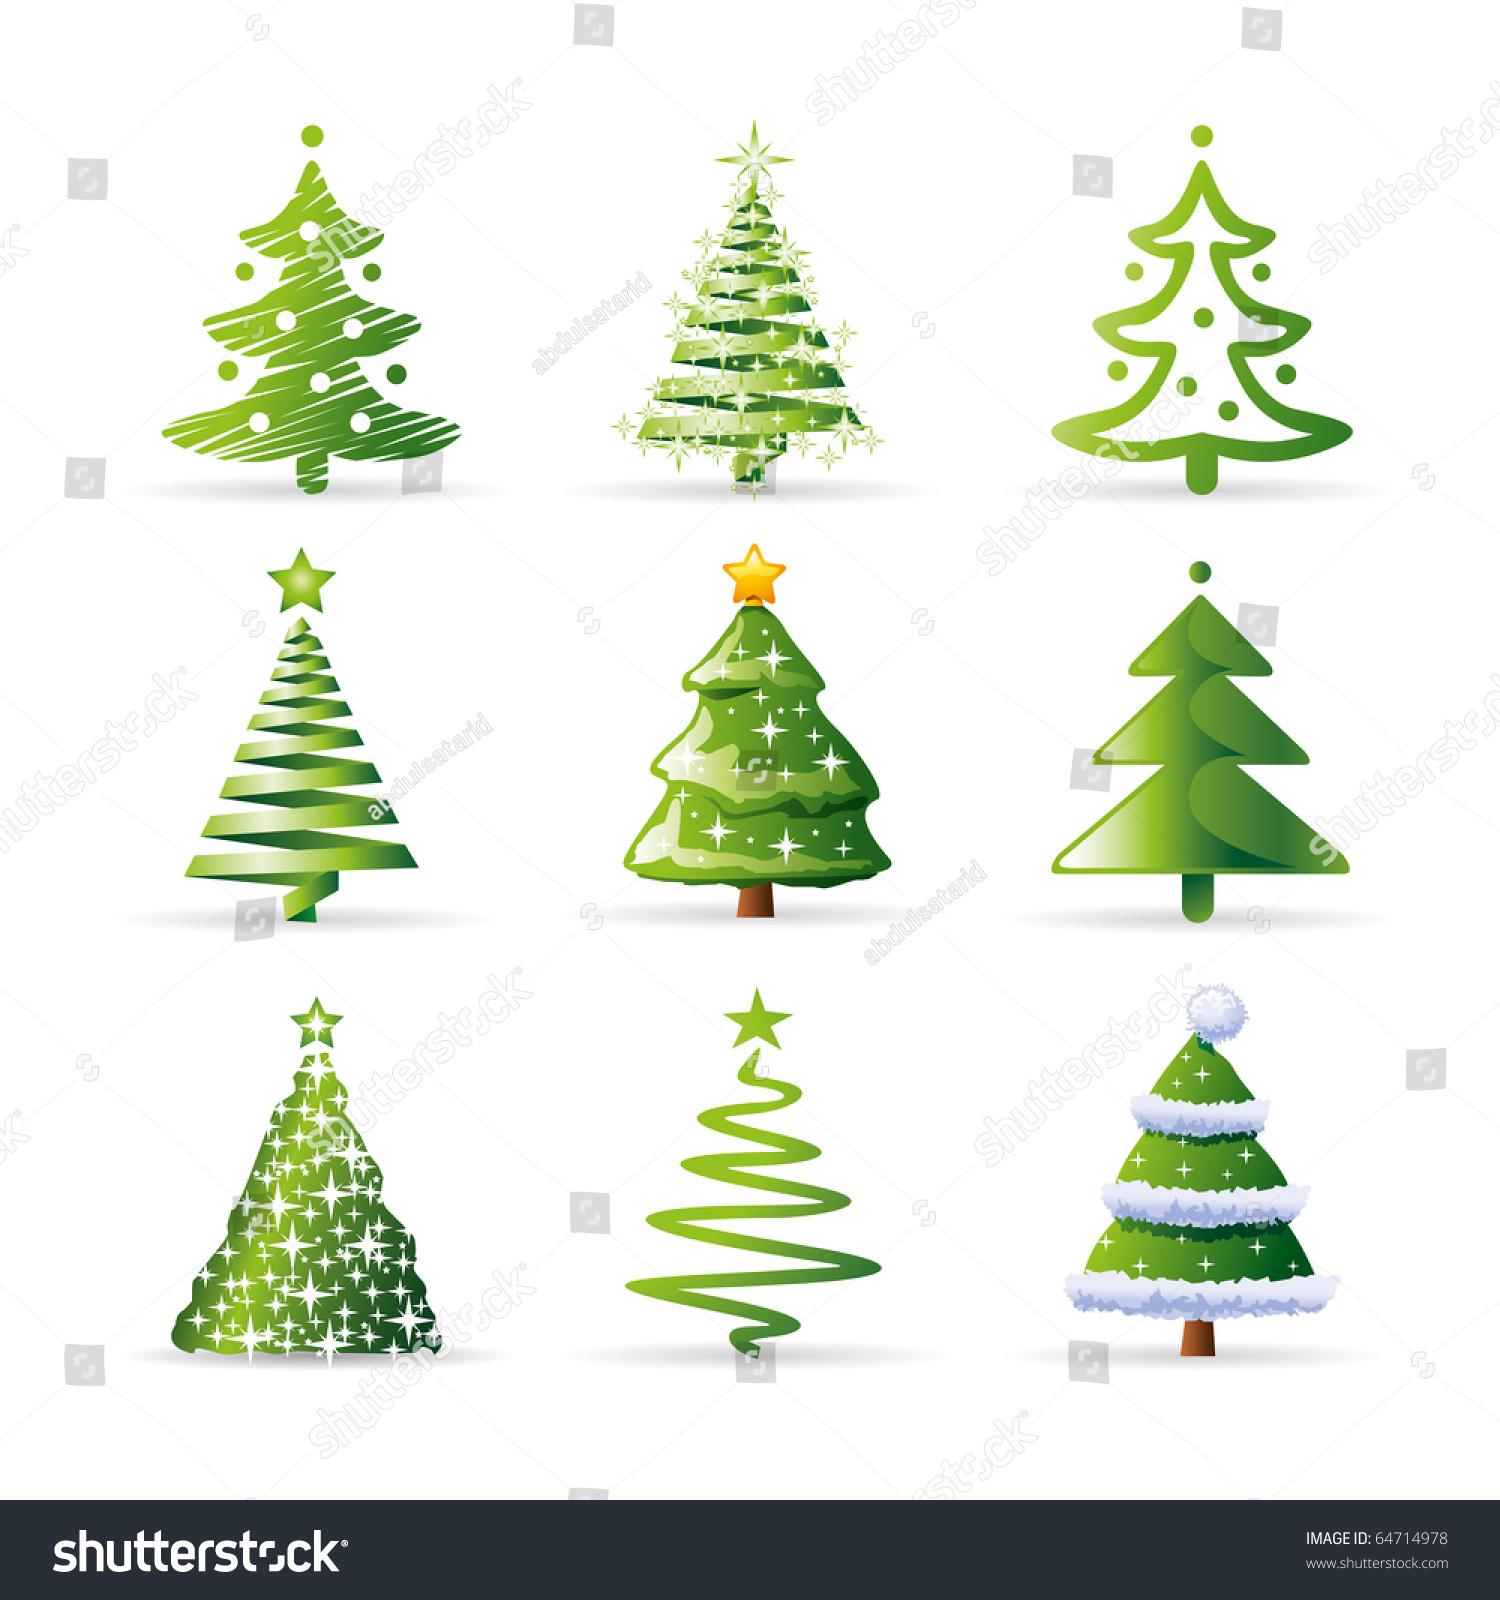 Vector Illustration Tree: Christmas Tree Set Stock Vector Illustration 64714978